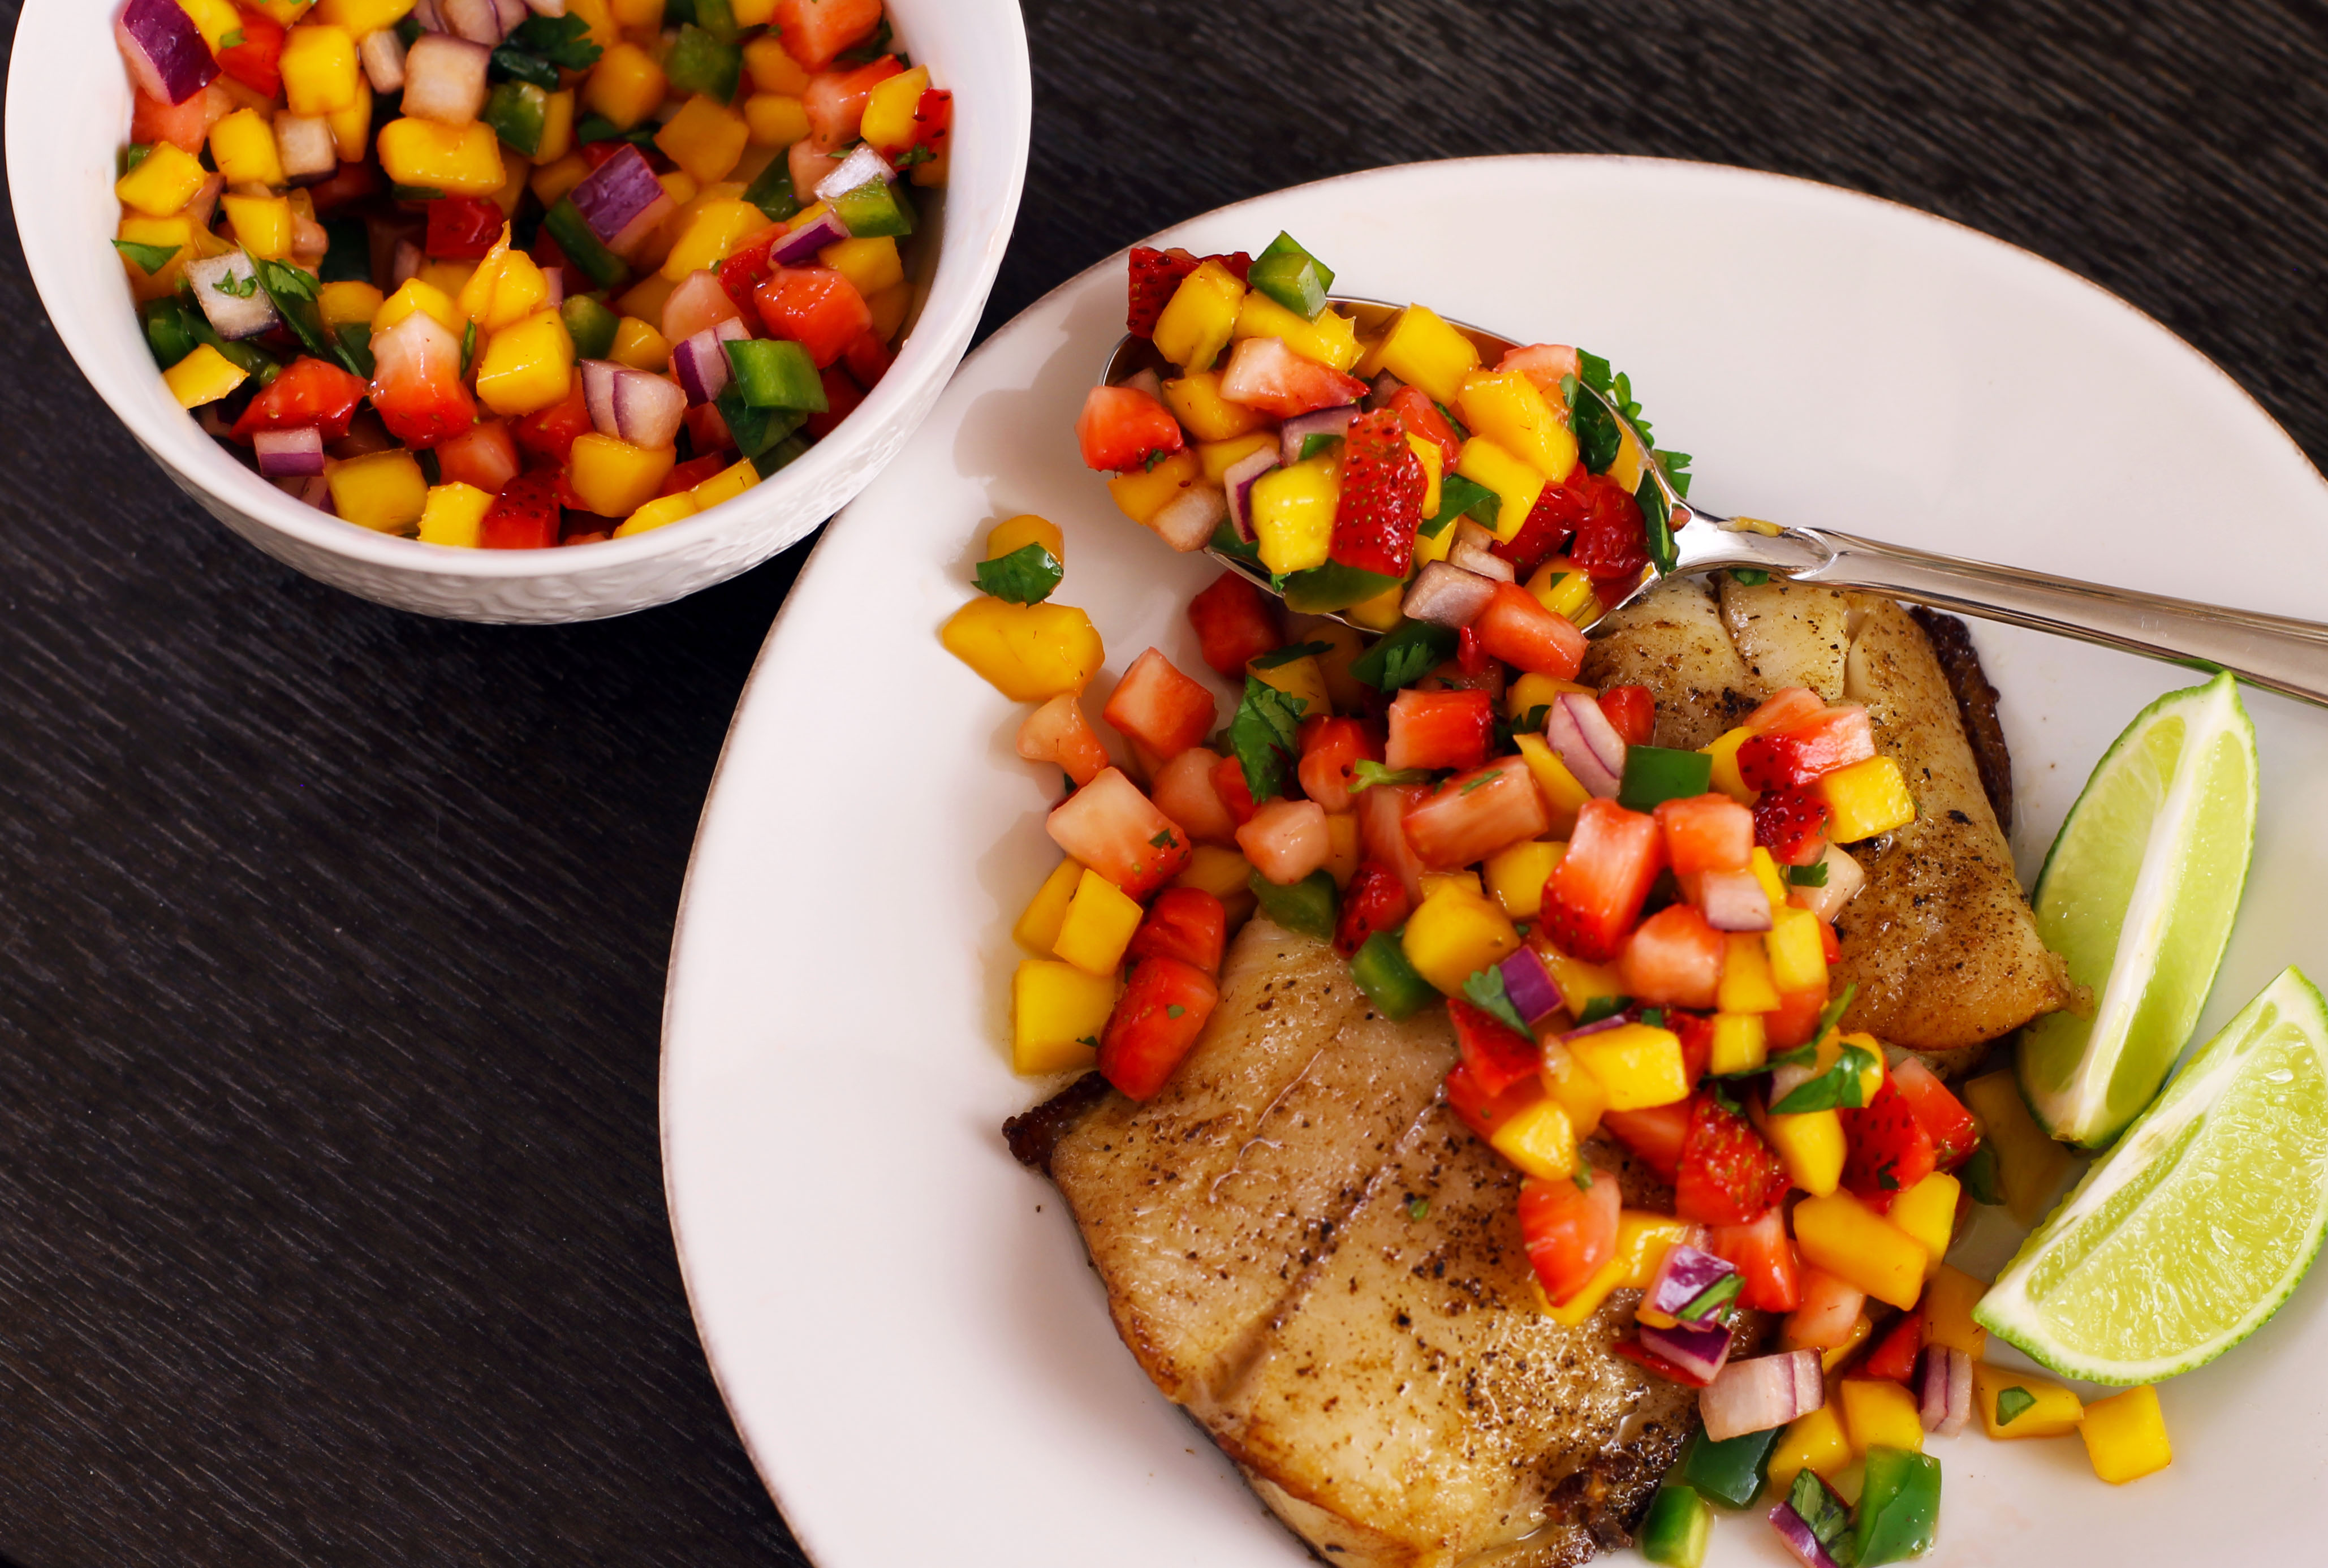 Black Cod with Strawberry-Mango Salsa